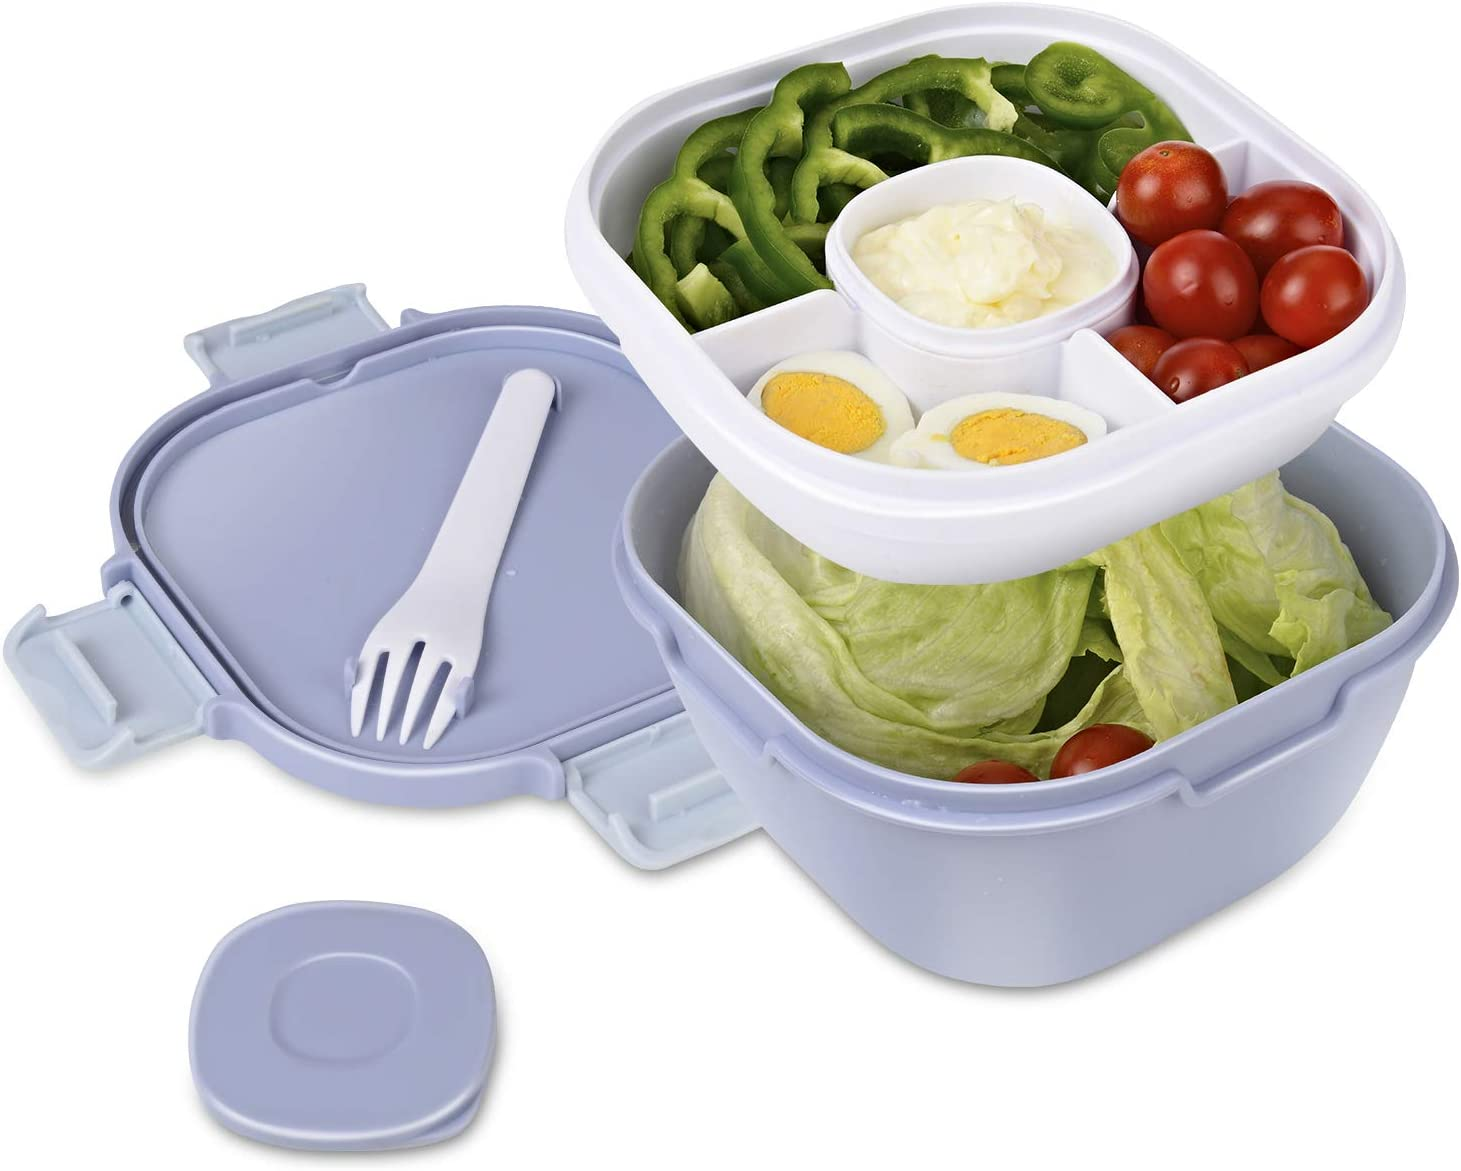 Upgraded Salad Bowl with Lid Leak-proof 57.5oz Stackable Salad L